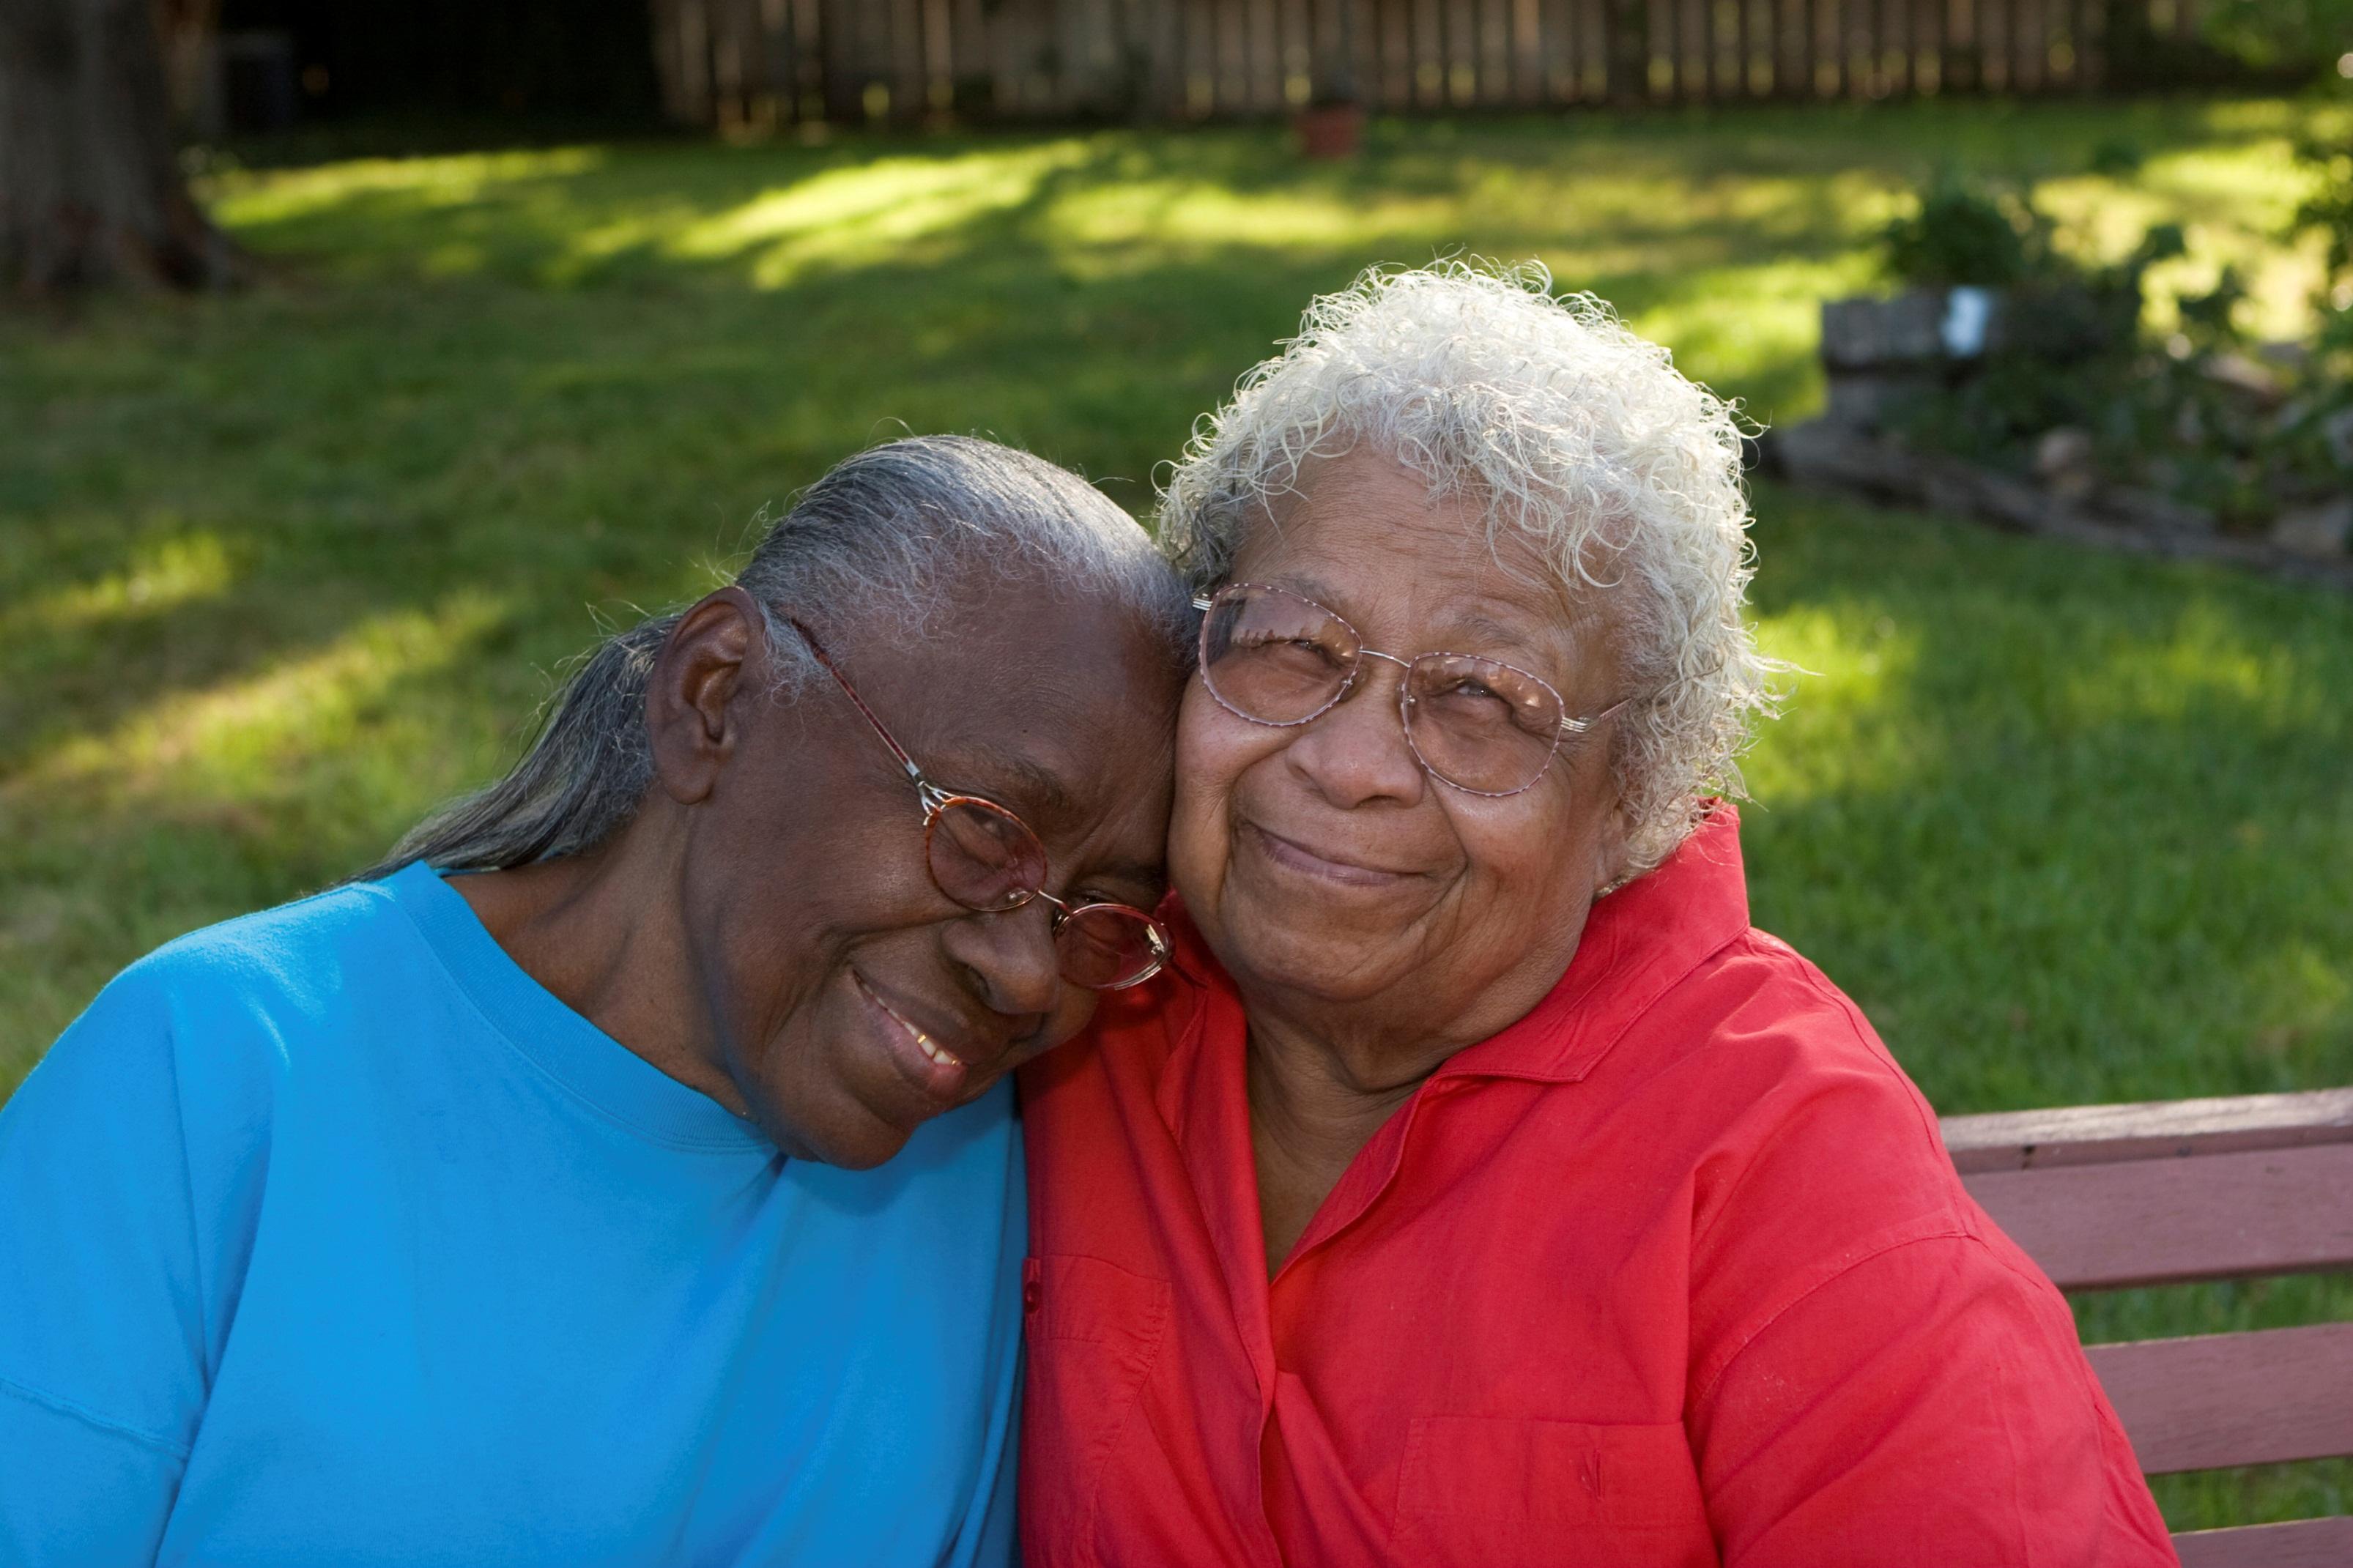 Adult daughter hugs her senior mother.